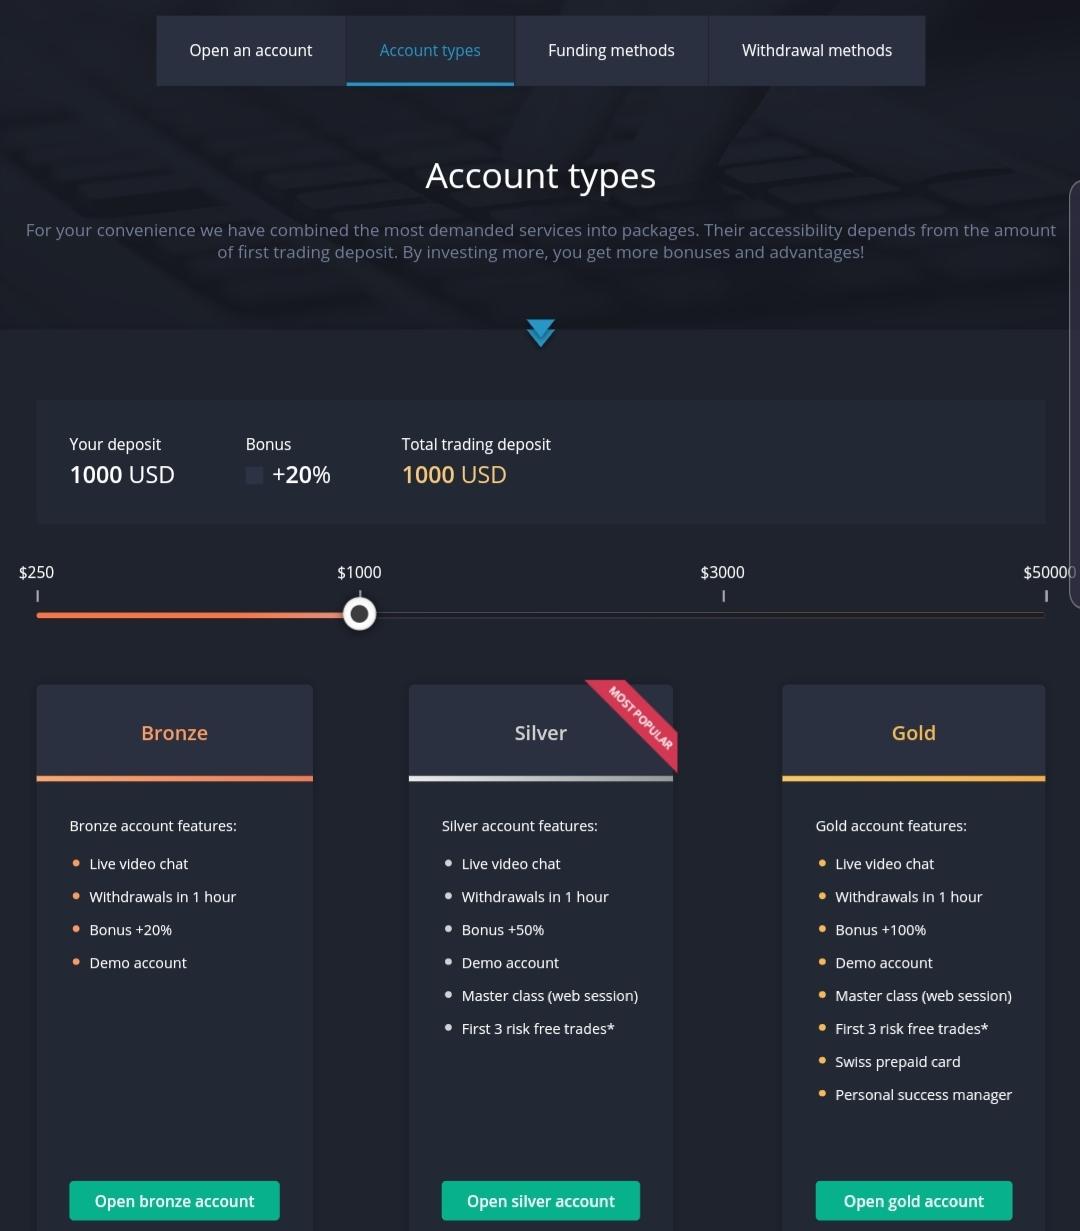 Binarymate account types